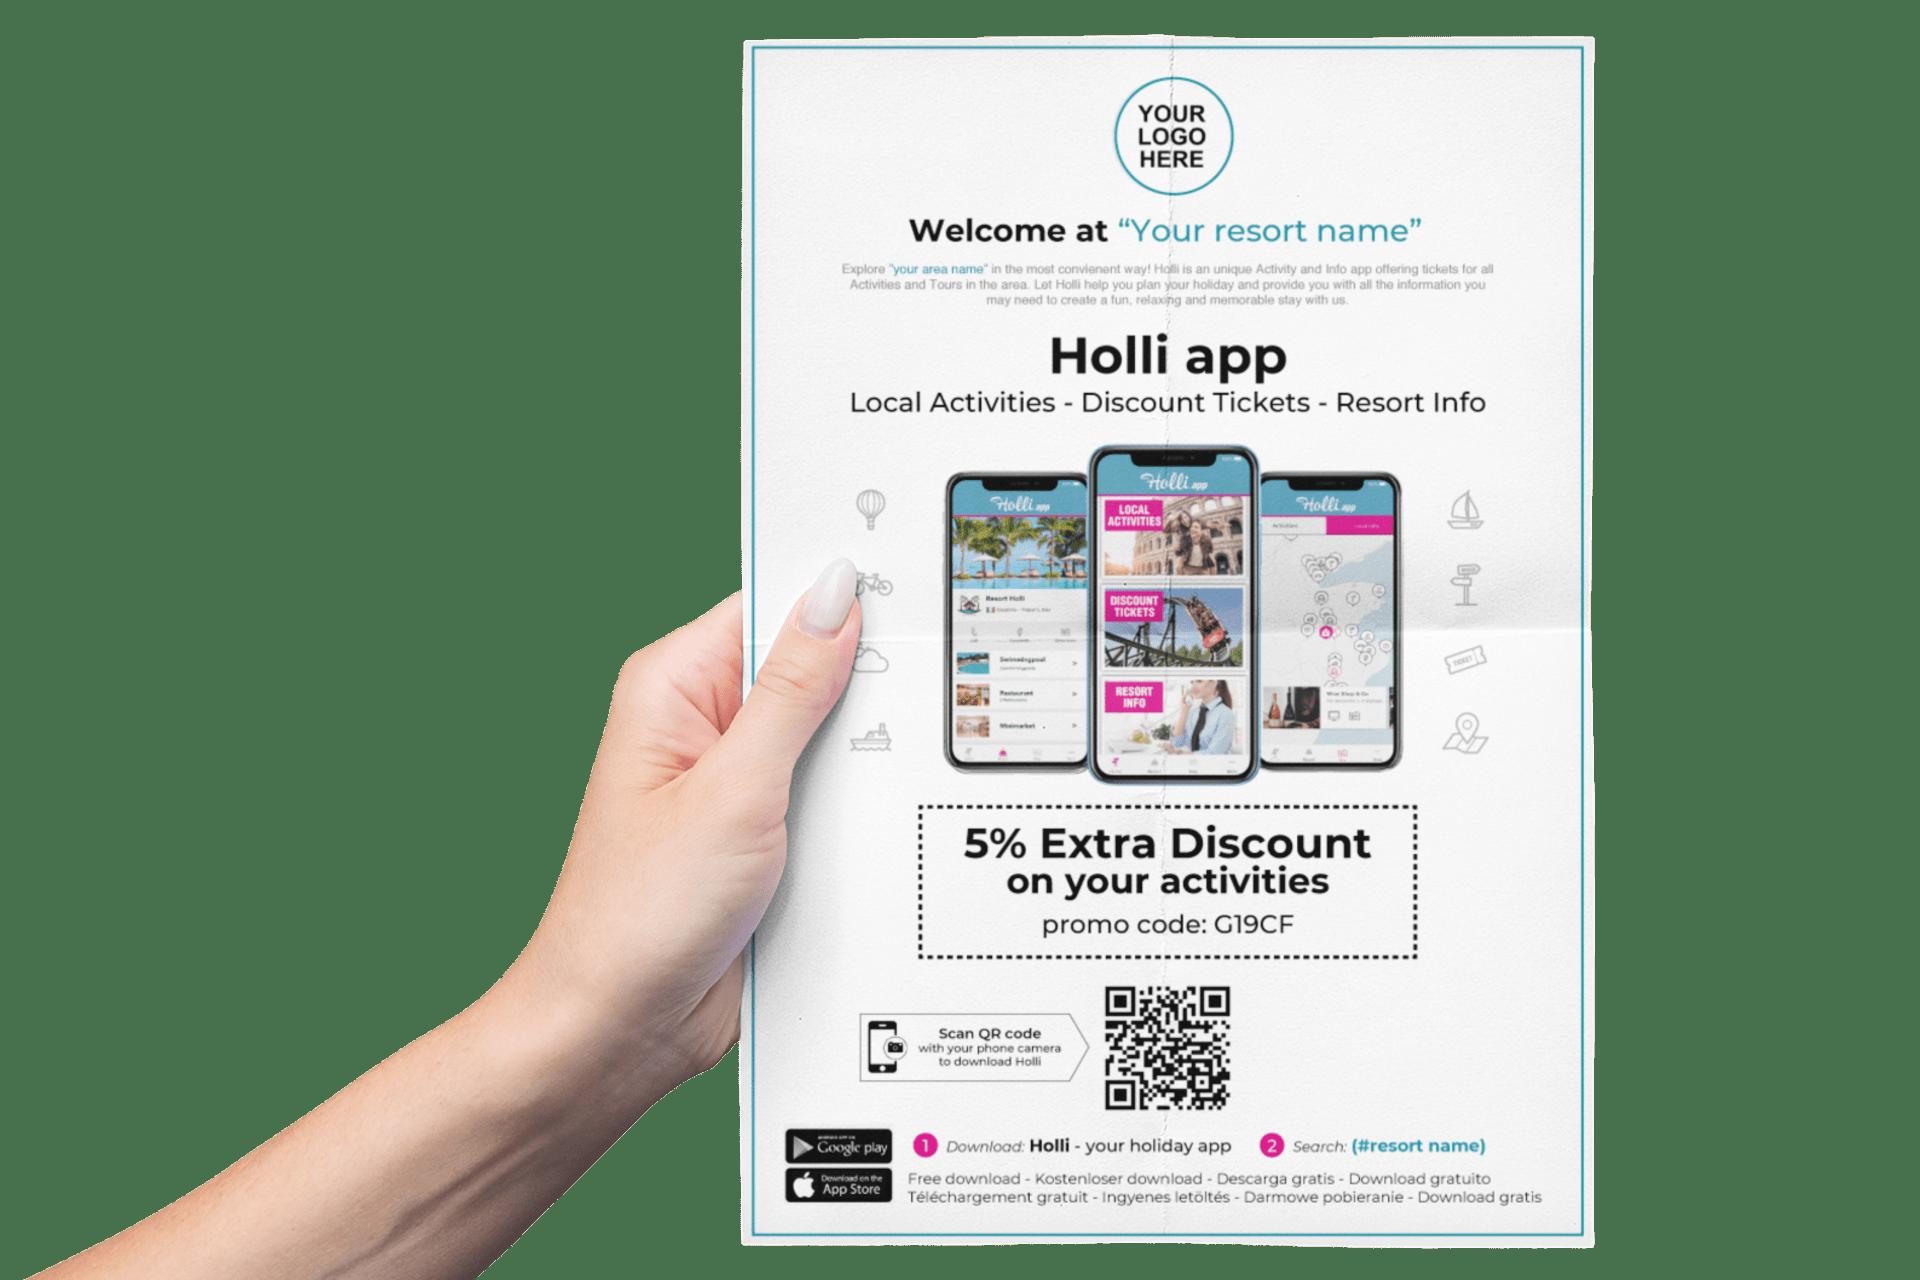 Holli-App promotion credits voucher